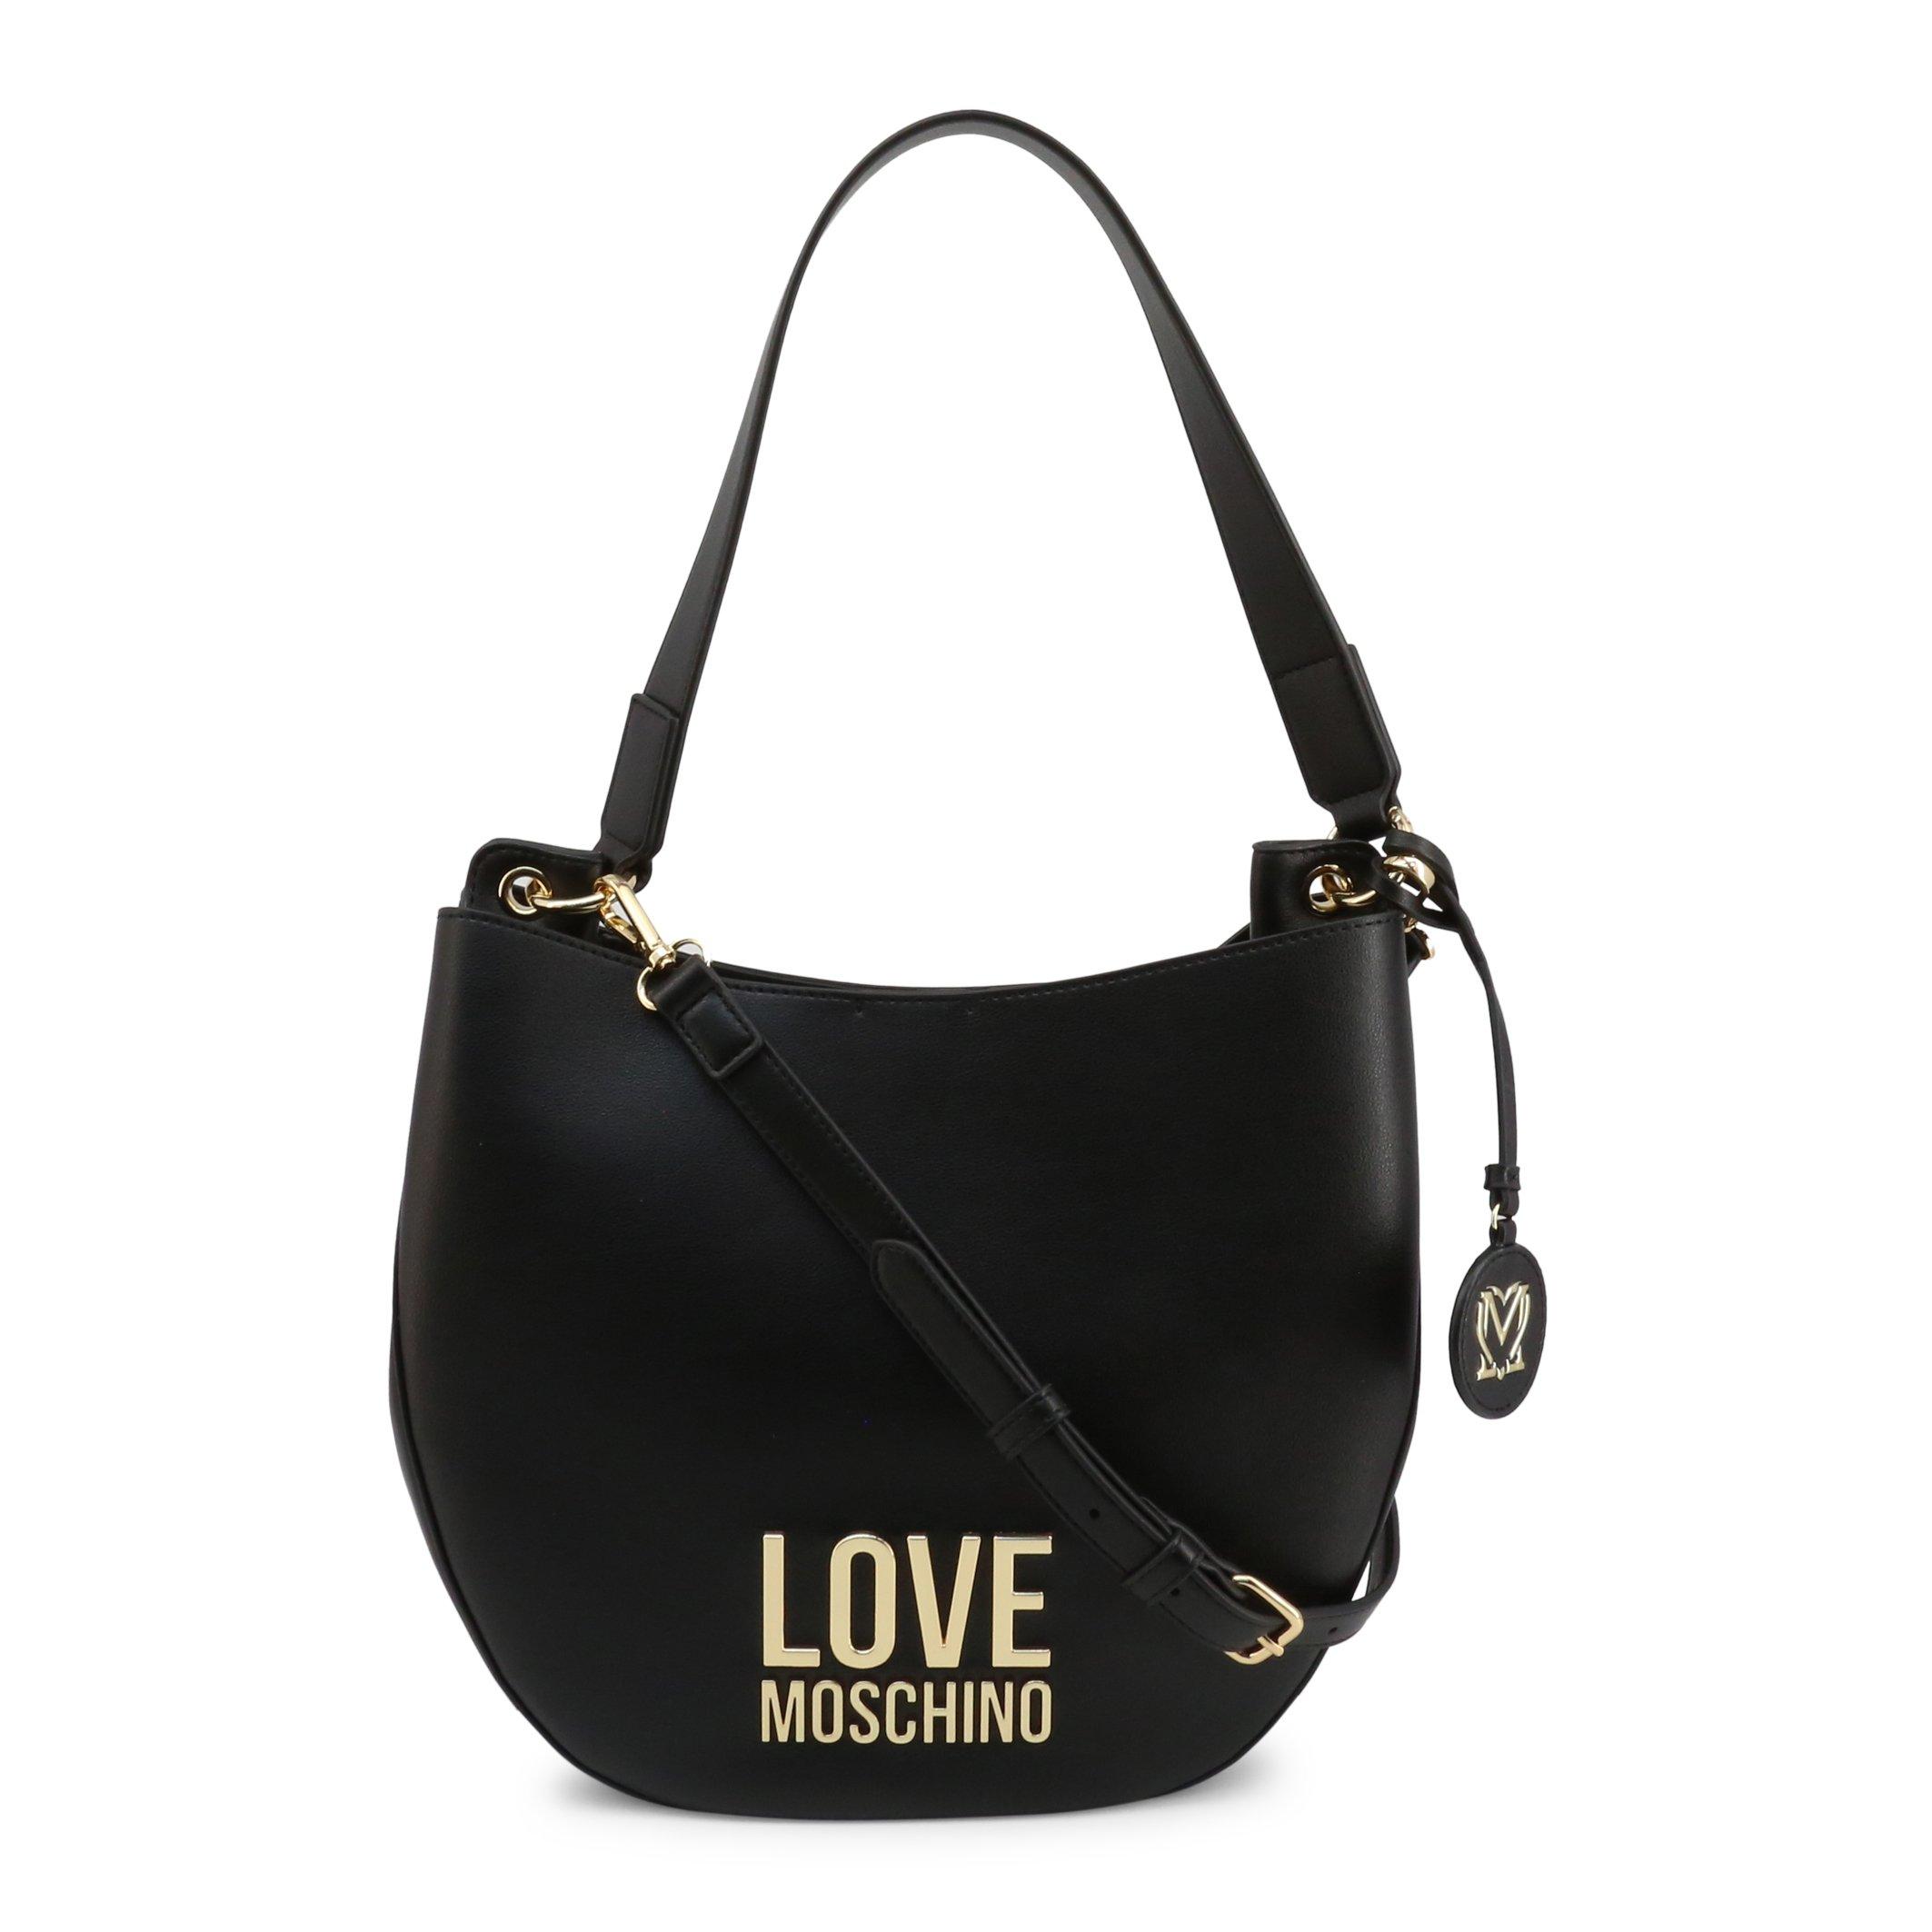 Love Moschino Women's Crossbody Bag Various Colours JC4106PP1CLJ0 - black-1 NOSIZE